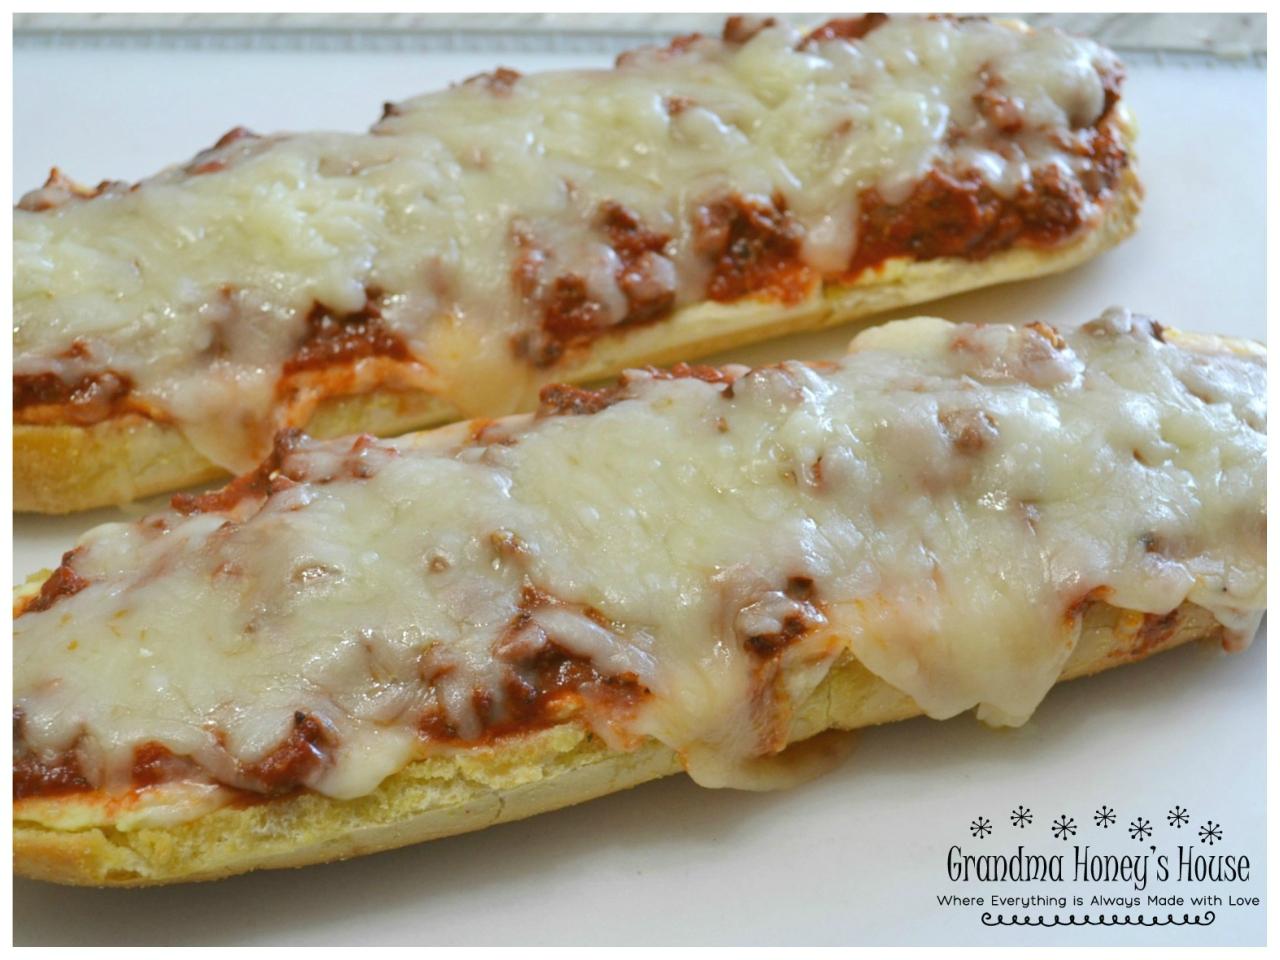 A crispy garlic bread lasagne appetizer.